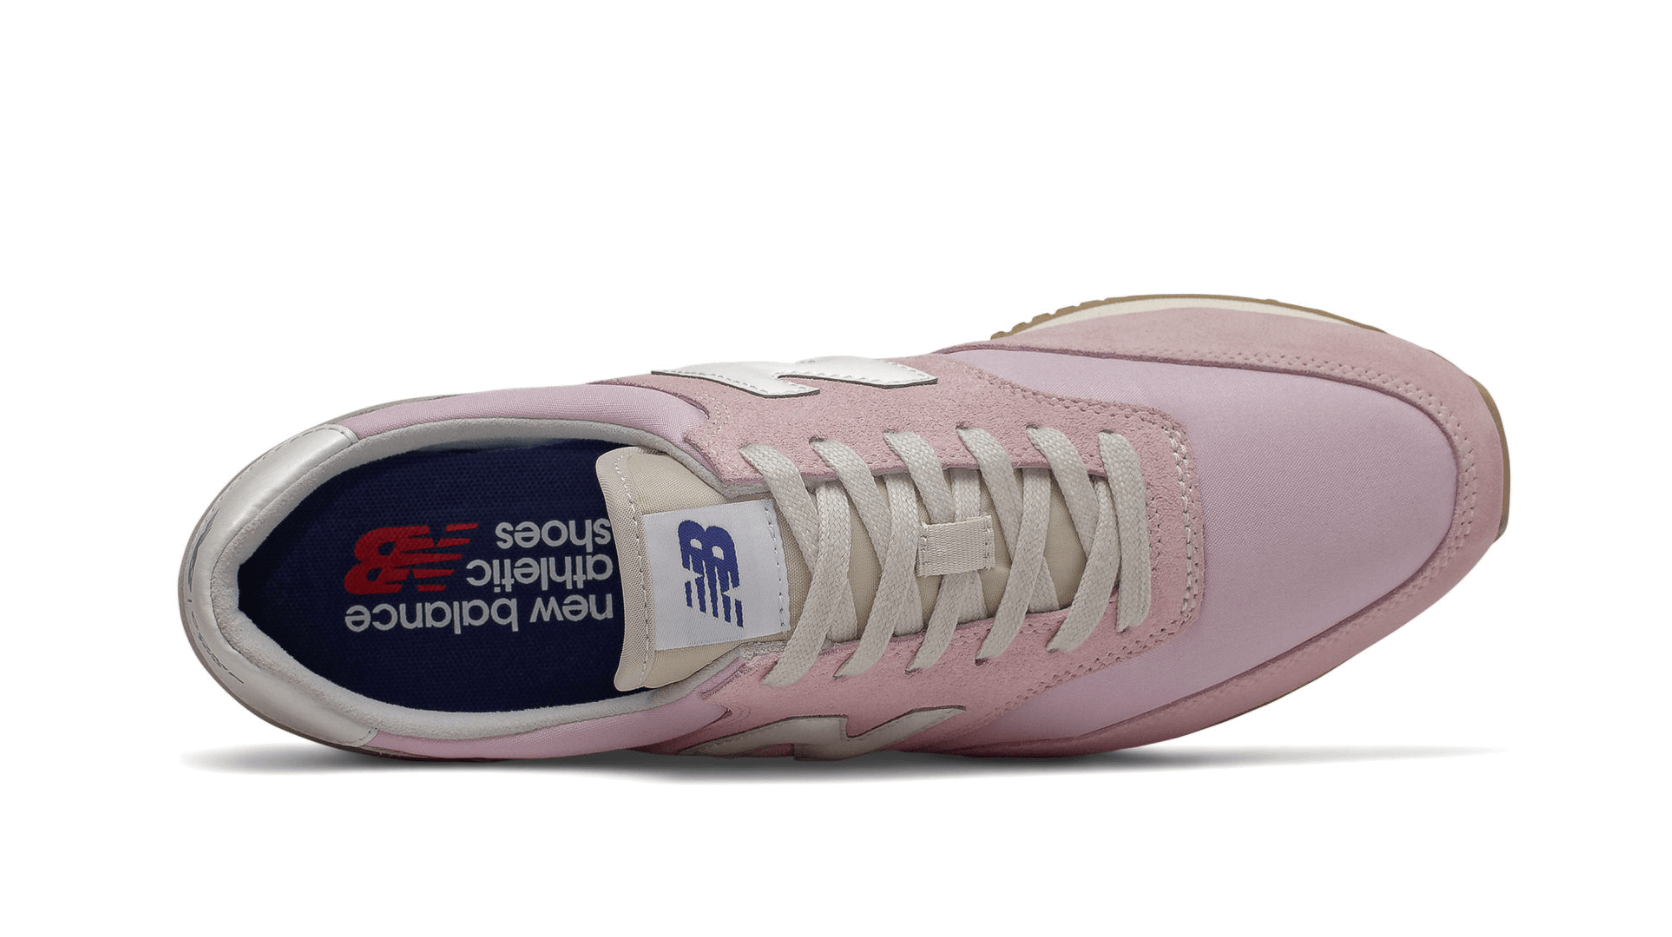 New Balance COMP 100 verano 2020 rosa